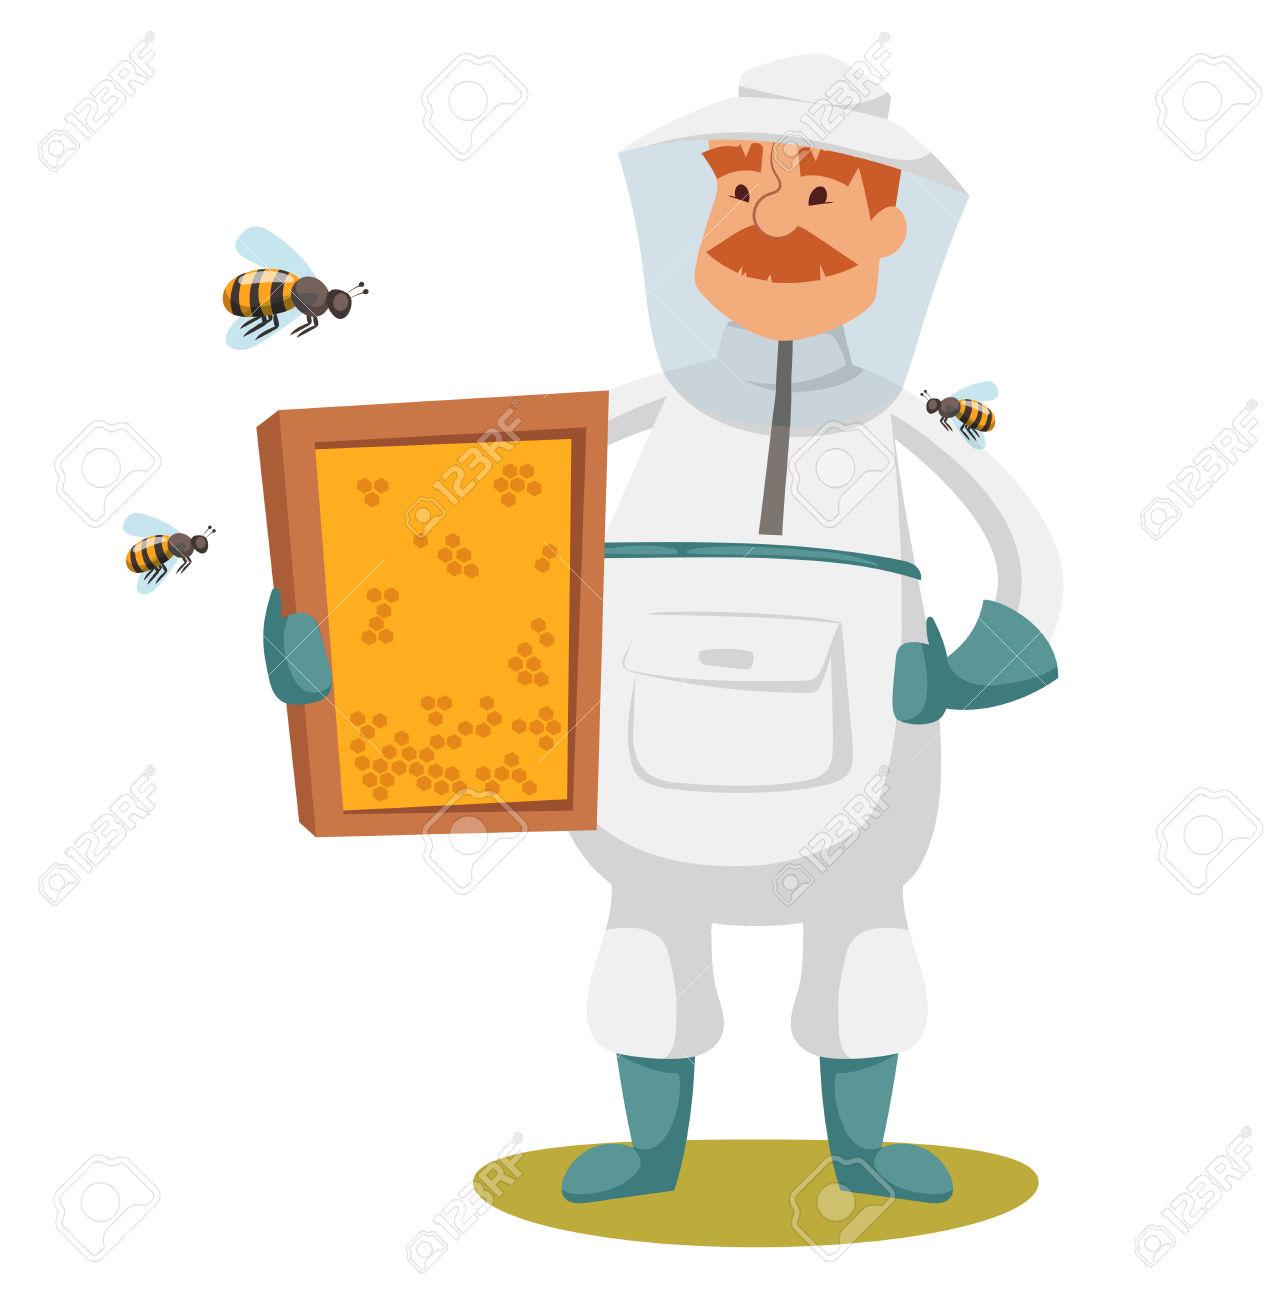 Apiary Beekeeper Vector Illustrations. Apiary Vector Symbols.